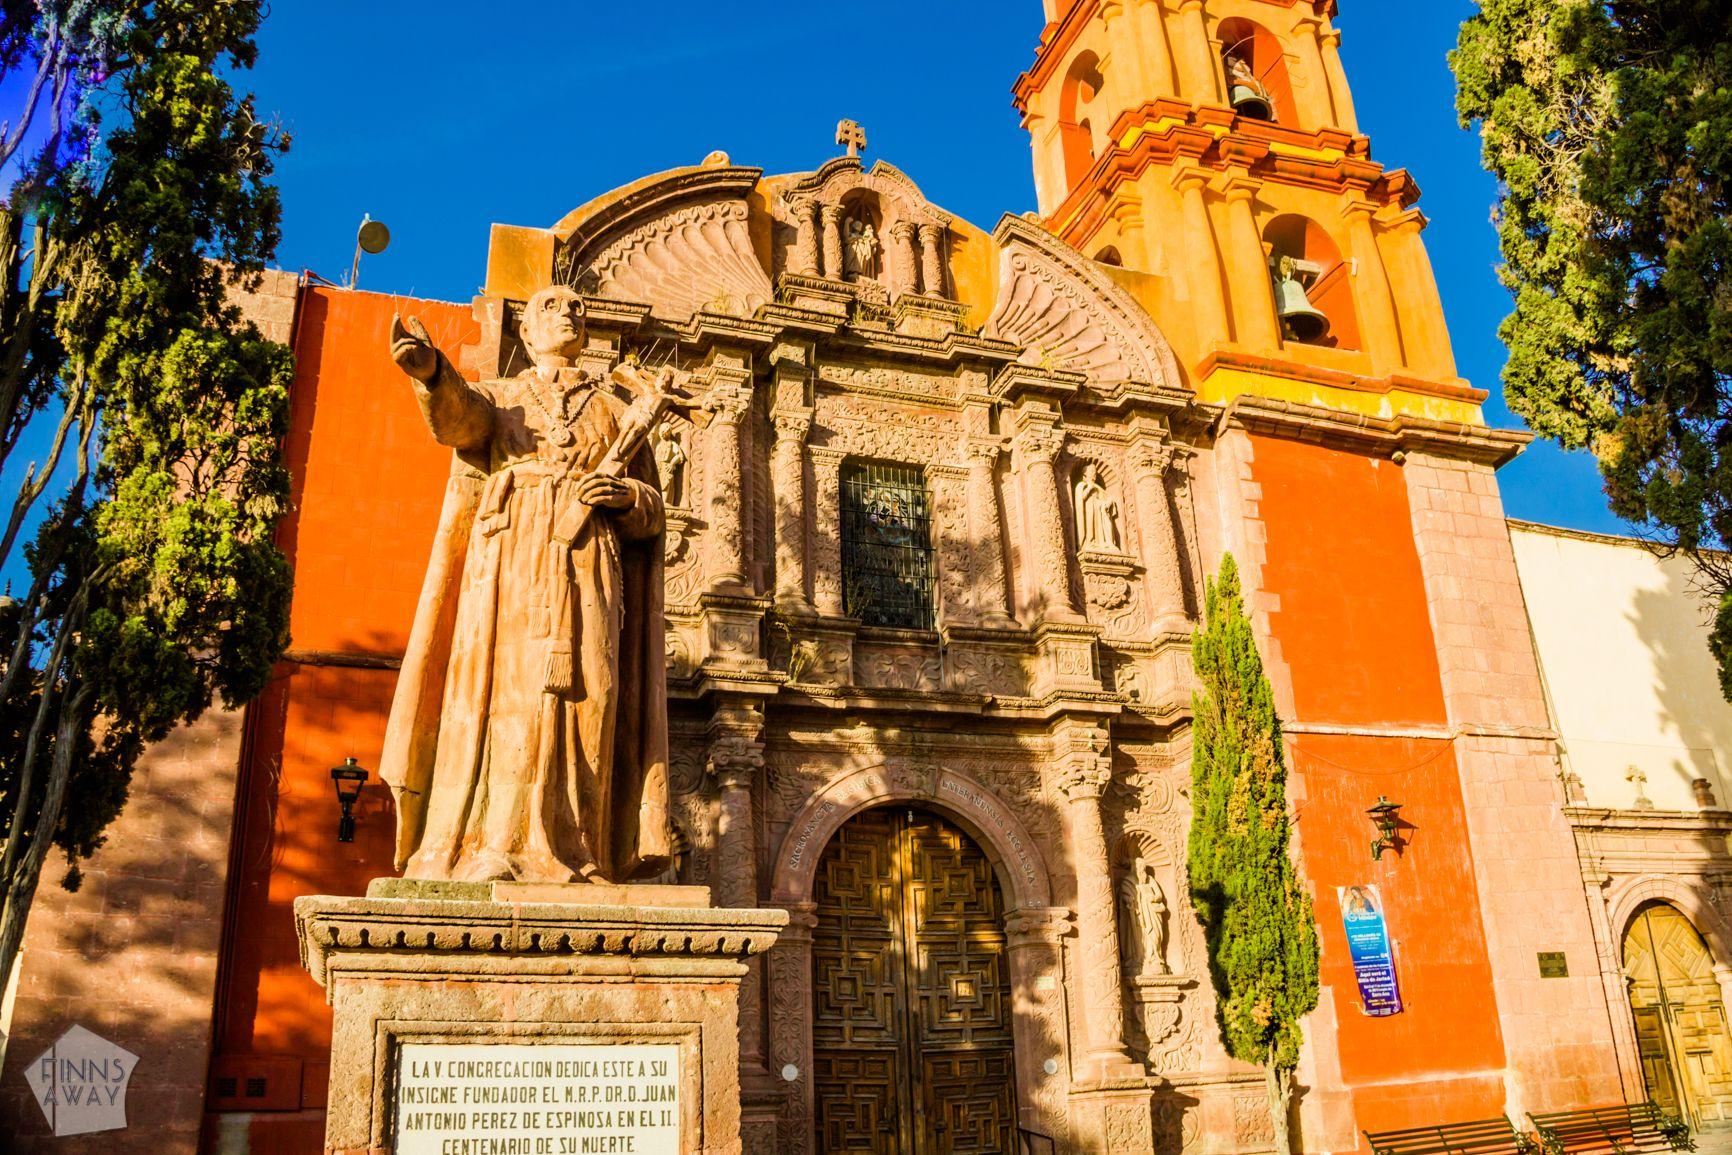 San Felipe Neri Oratory, San Miguel de Allende | FinnsAway Travel Blog